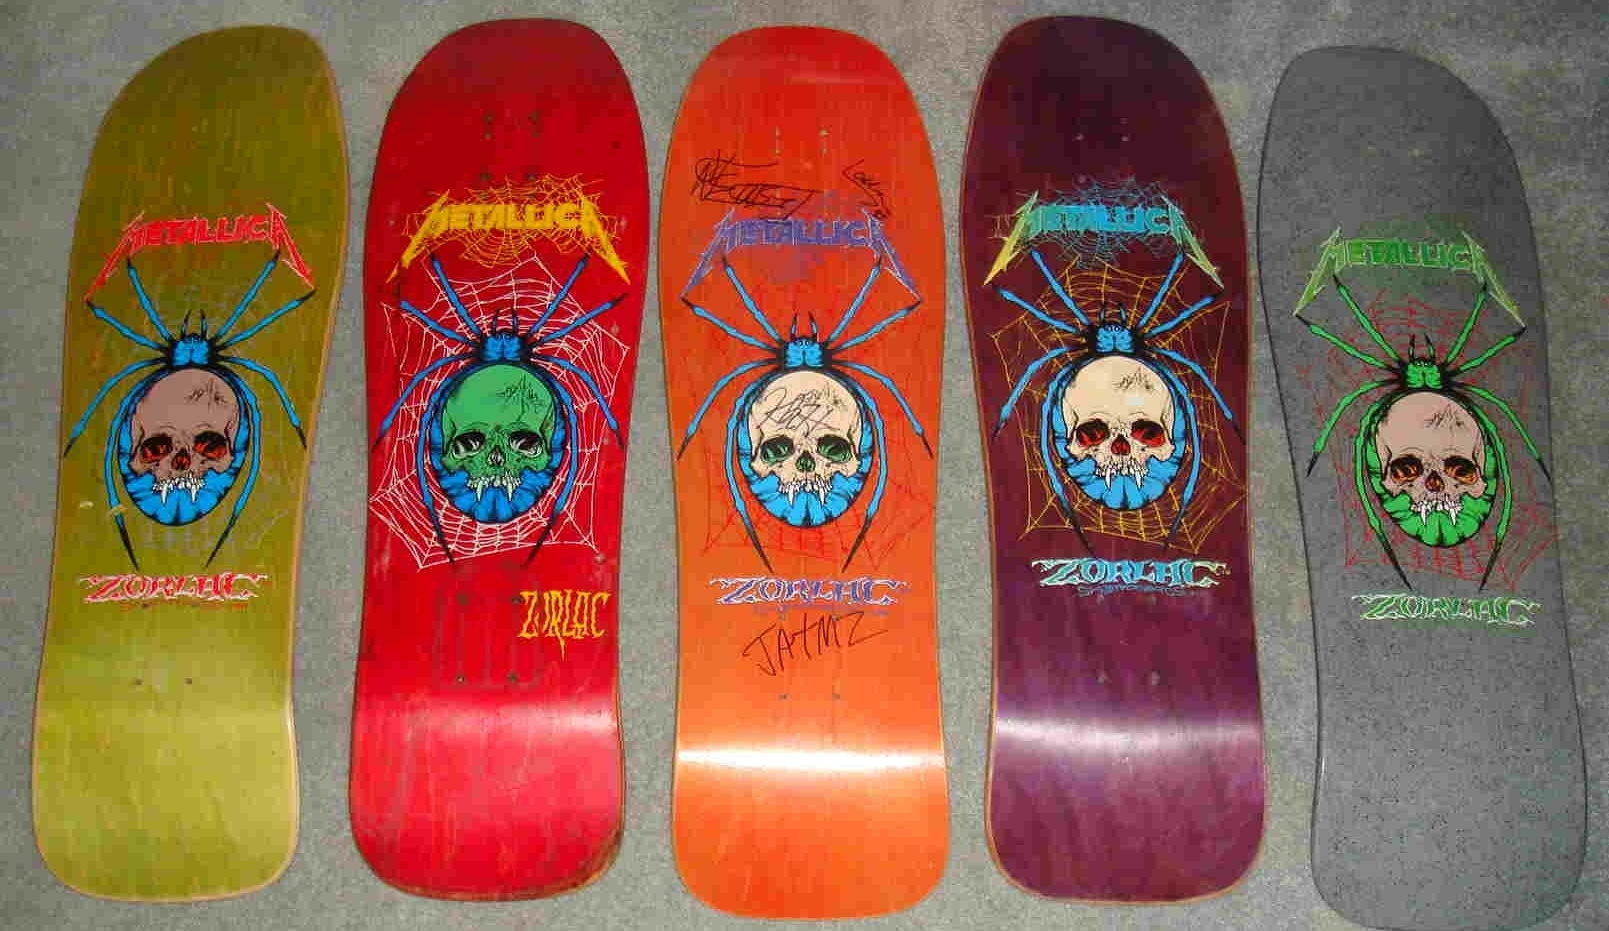 Skate metal